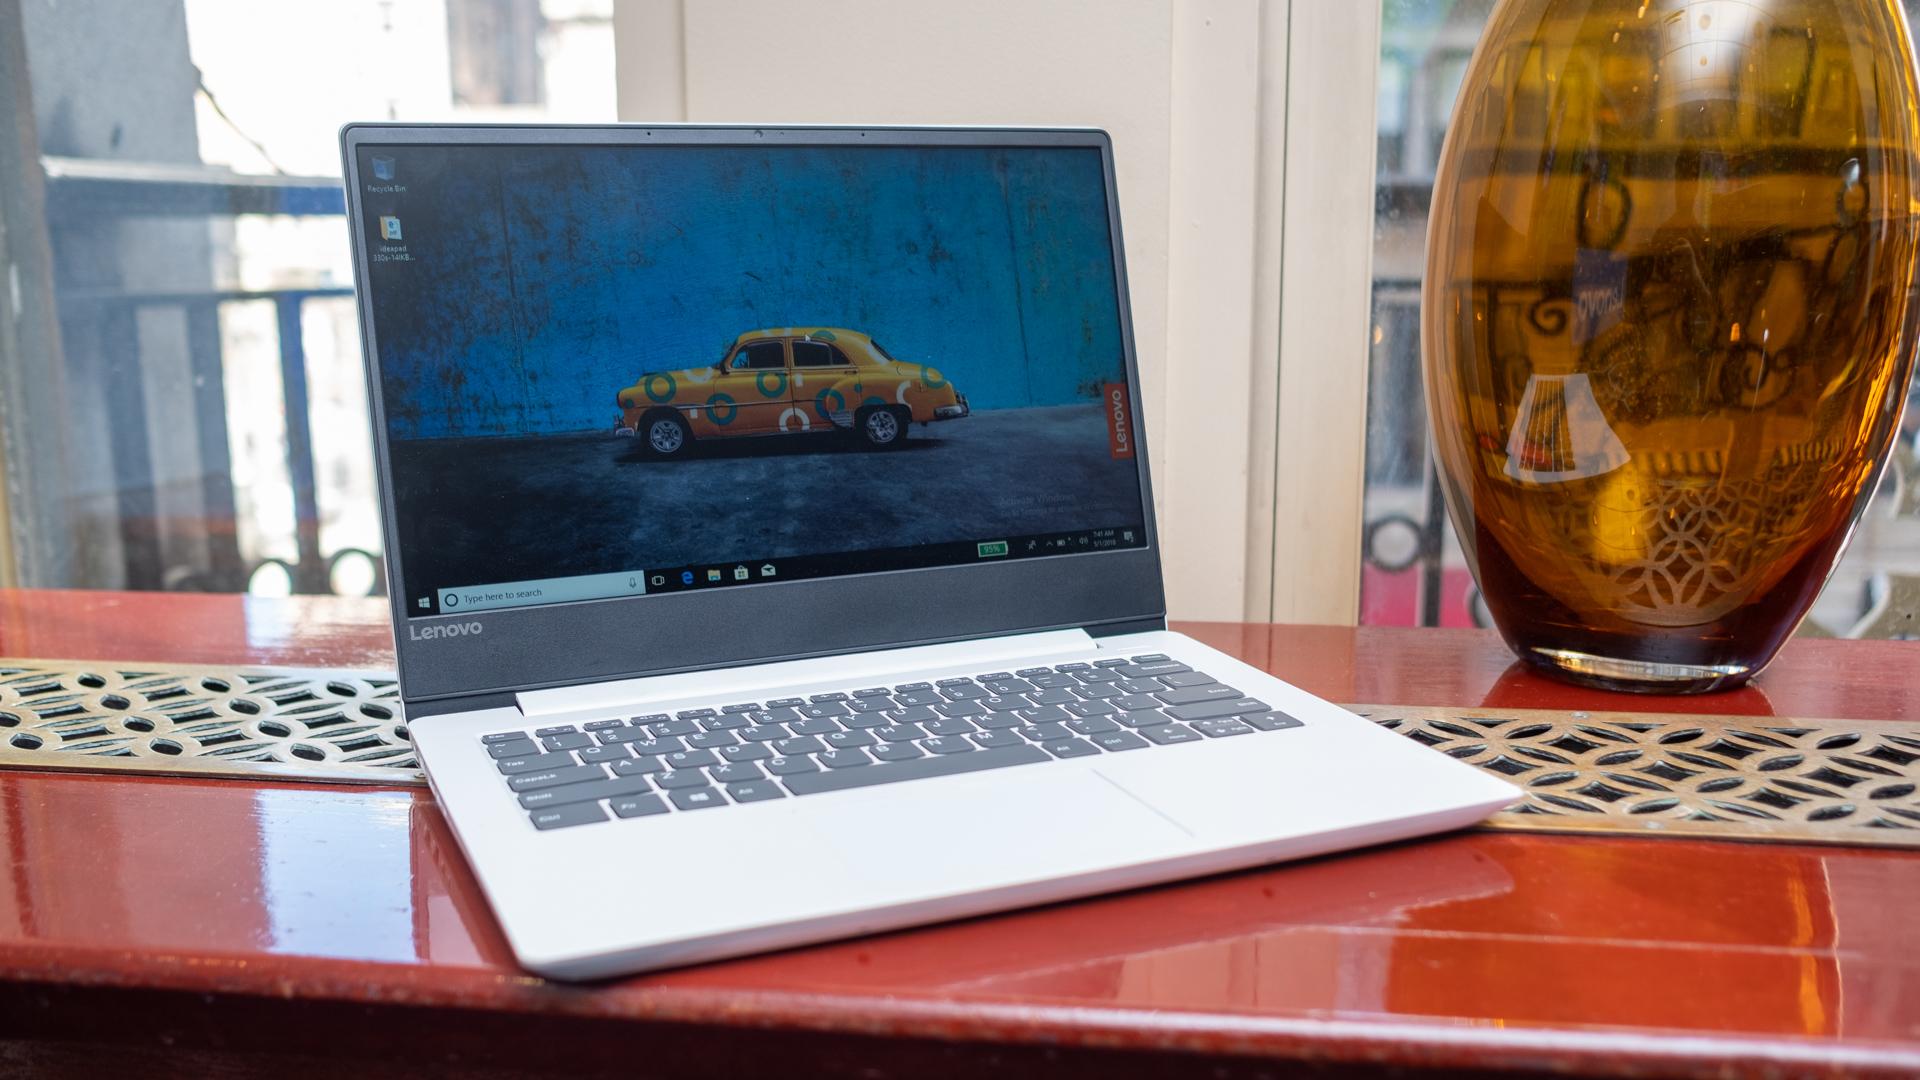 lenovo ideapad 330 15.6 laptop windows 10 intel celeron n4000 dual-core processor